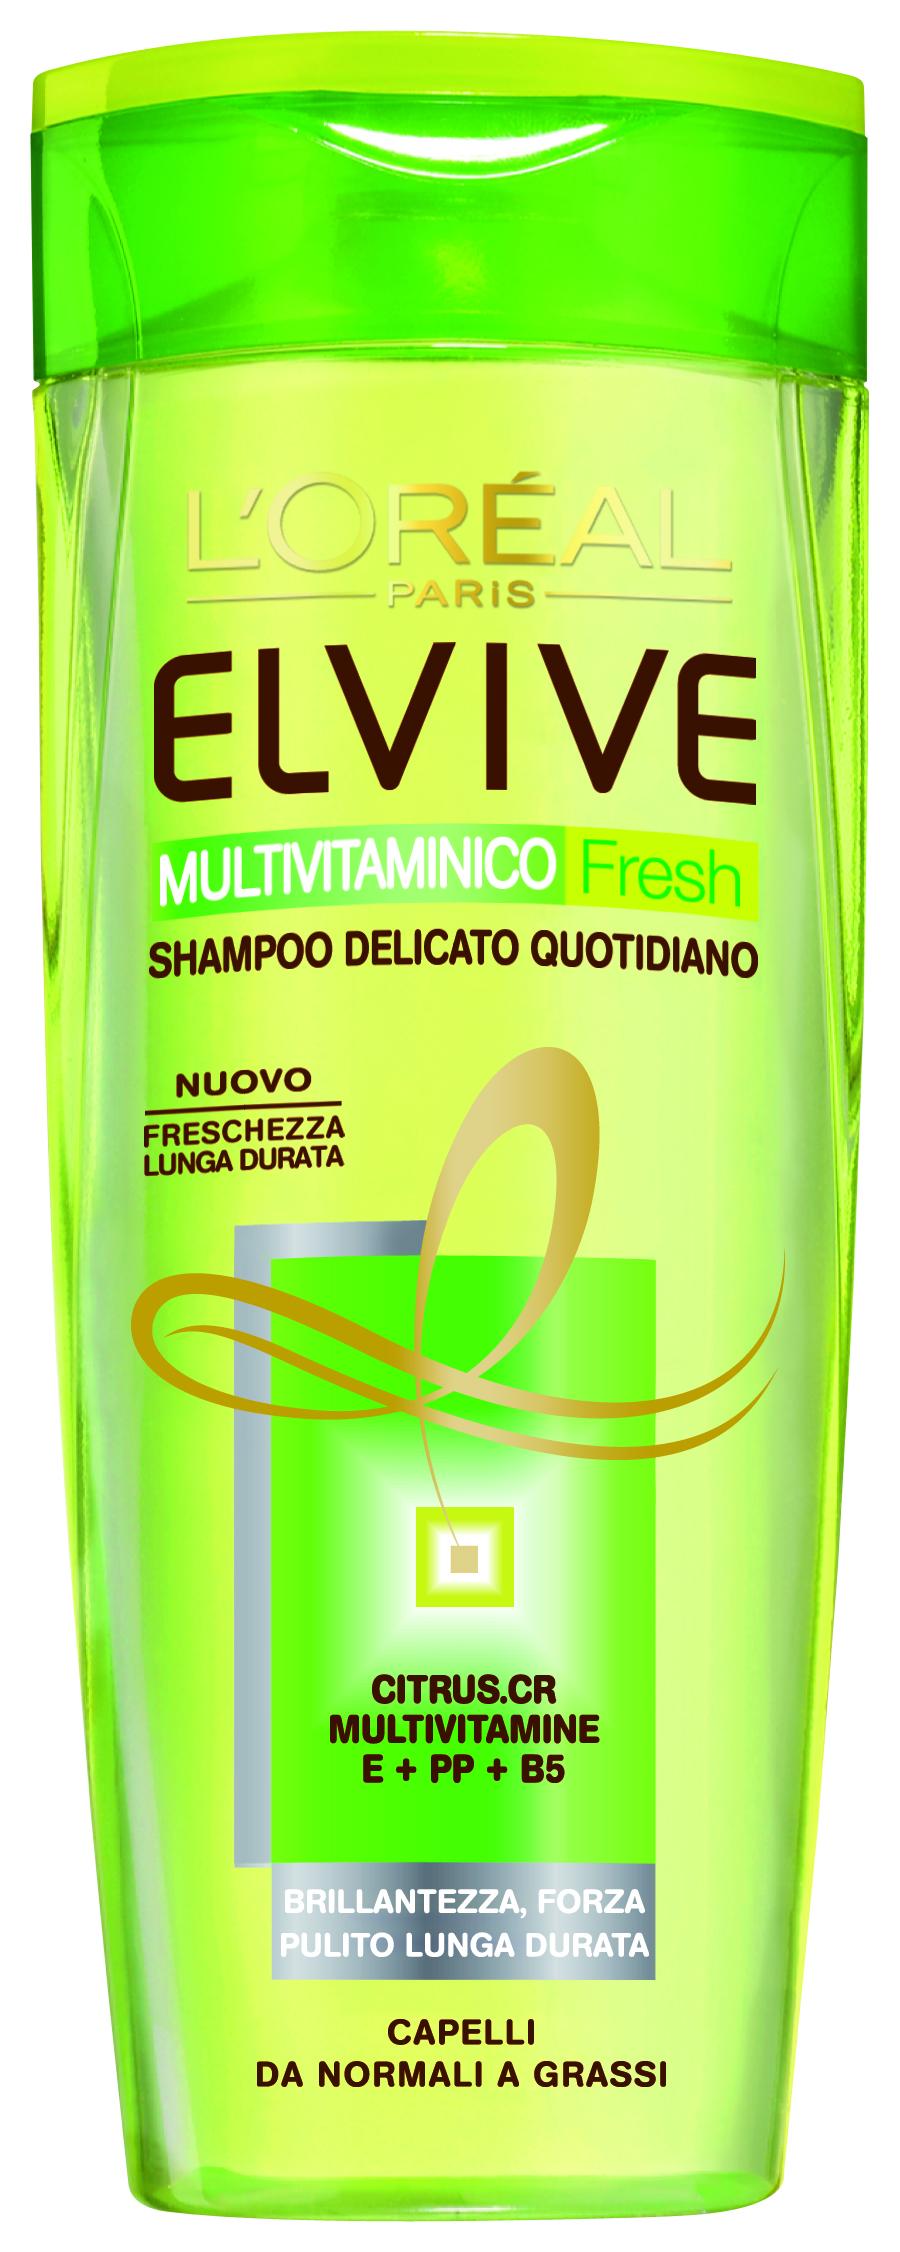 Shampoo Elvive L'Oreal